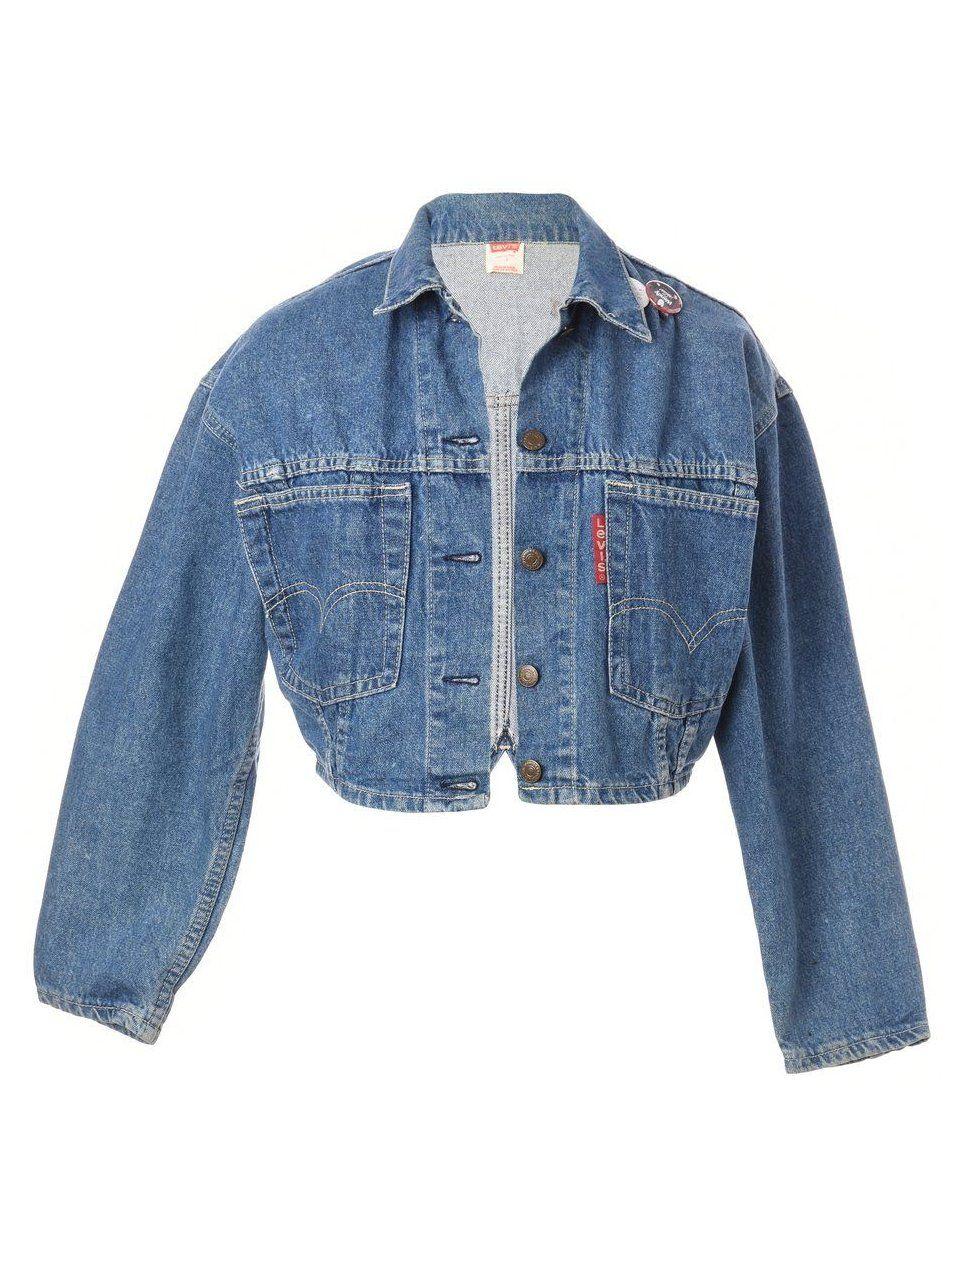 Women S Vintage Jackets Beyond Retro Levi S Cropped Denim Jacket In 2020 Jacket Outfit Women Vintage Jacket Vintage Denim Jacket